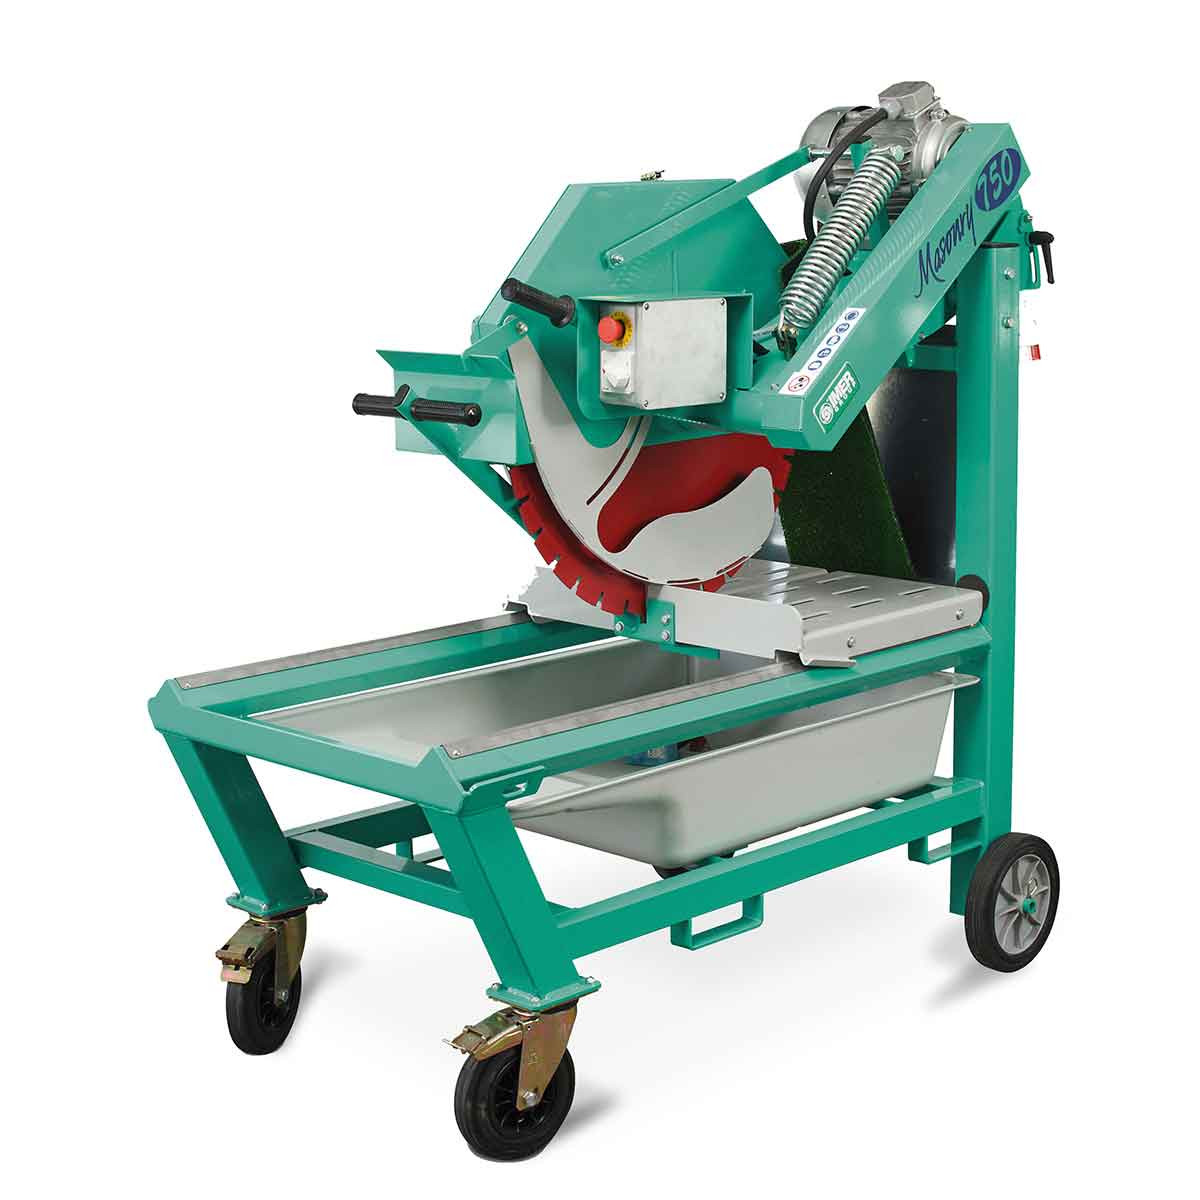 Imer 750 masonry block paver saw